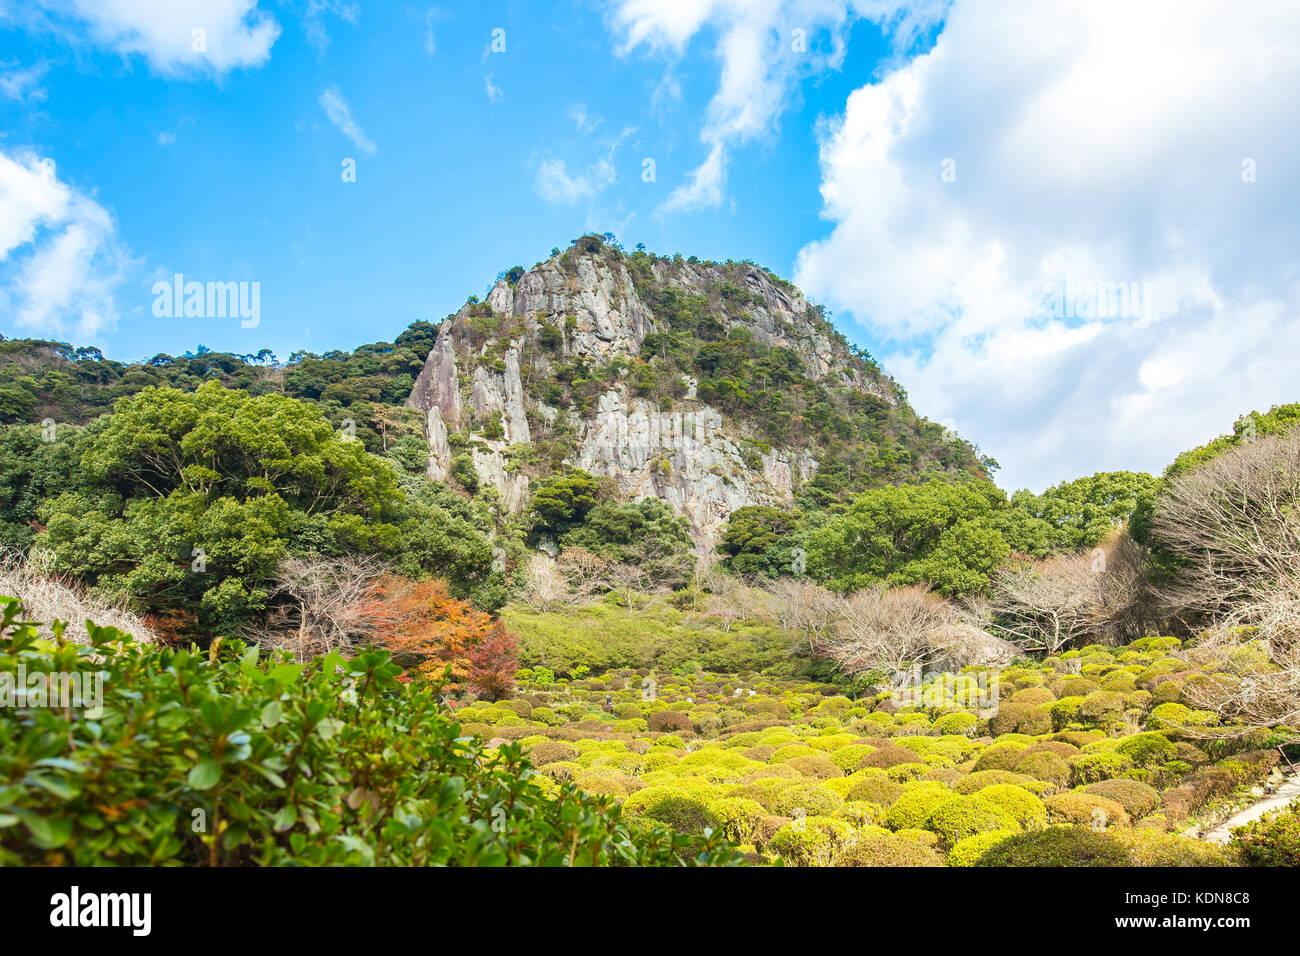 Mifuneyama Gardens in Takeo, Saga, Japan. - Stock Image